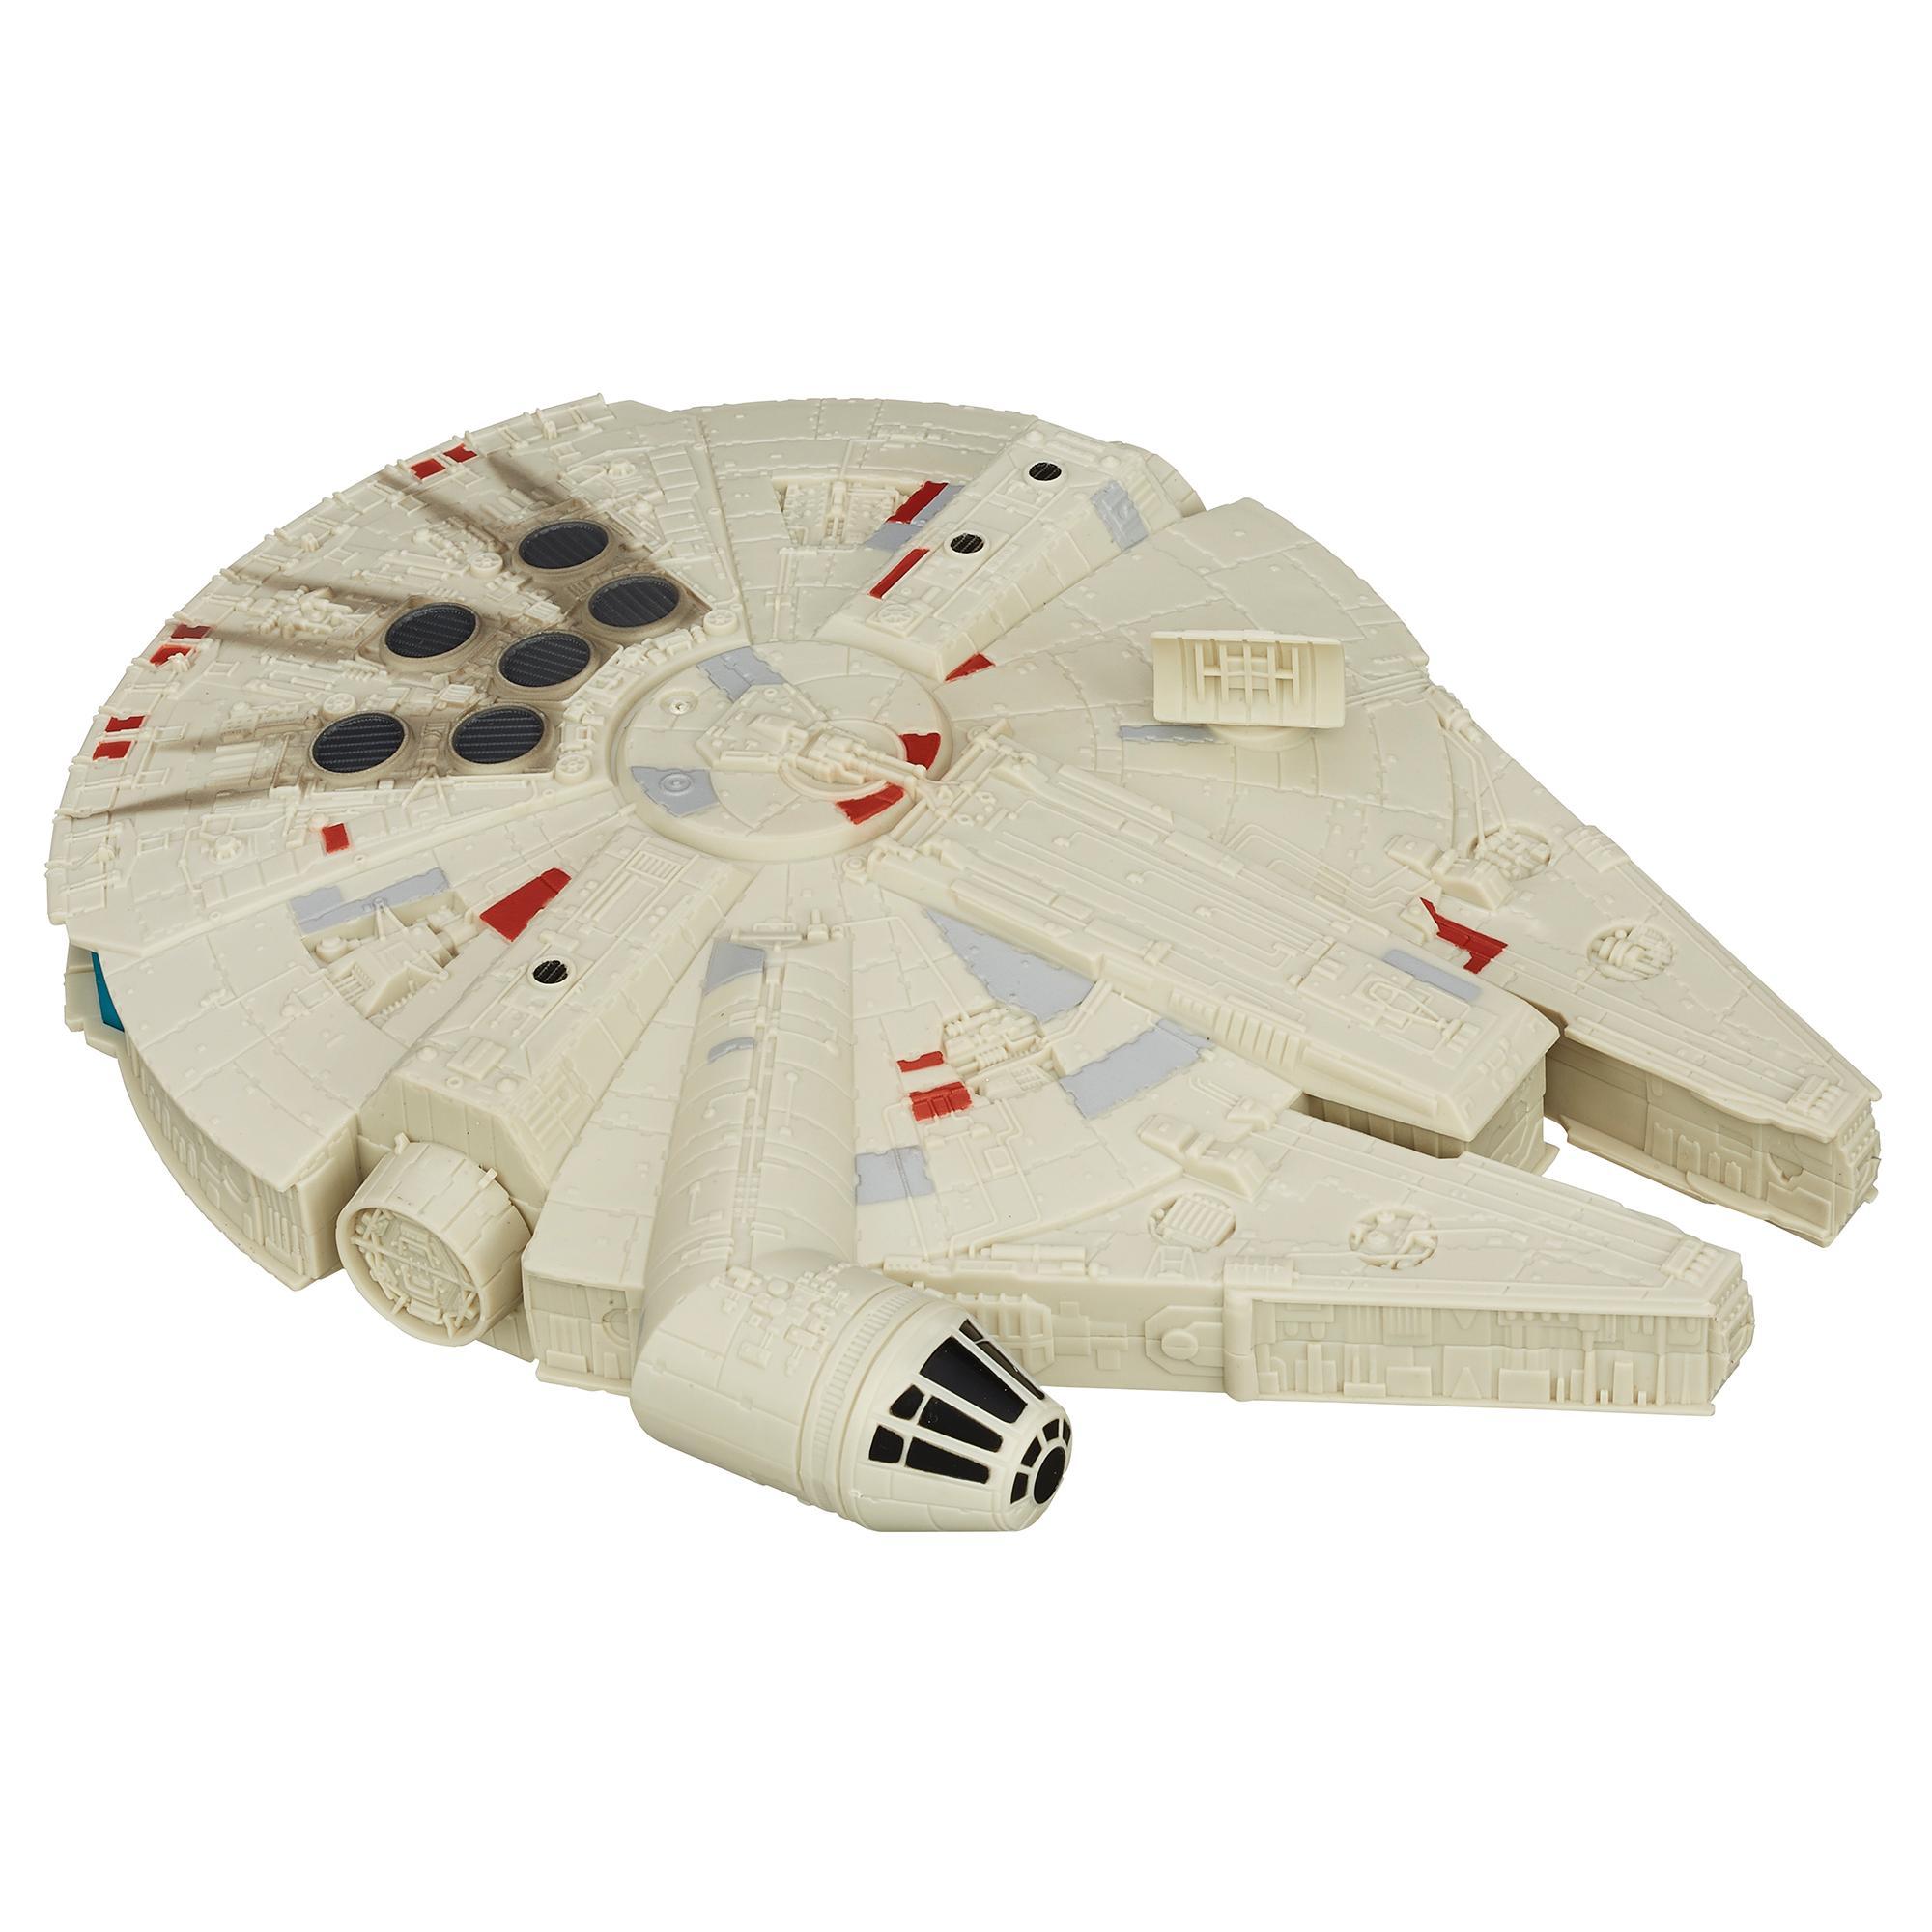 Star Wars The Force Awakens Value Millennium Falcon